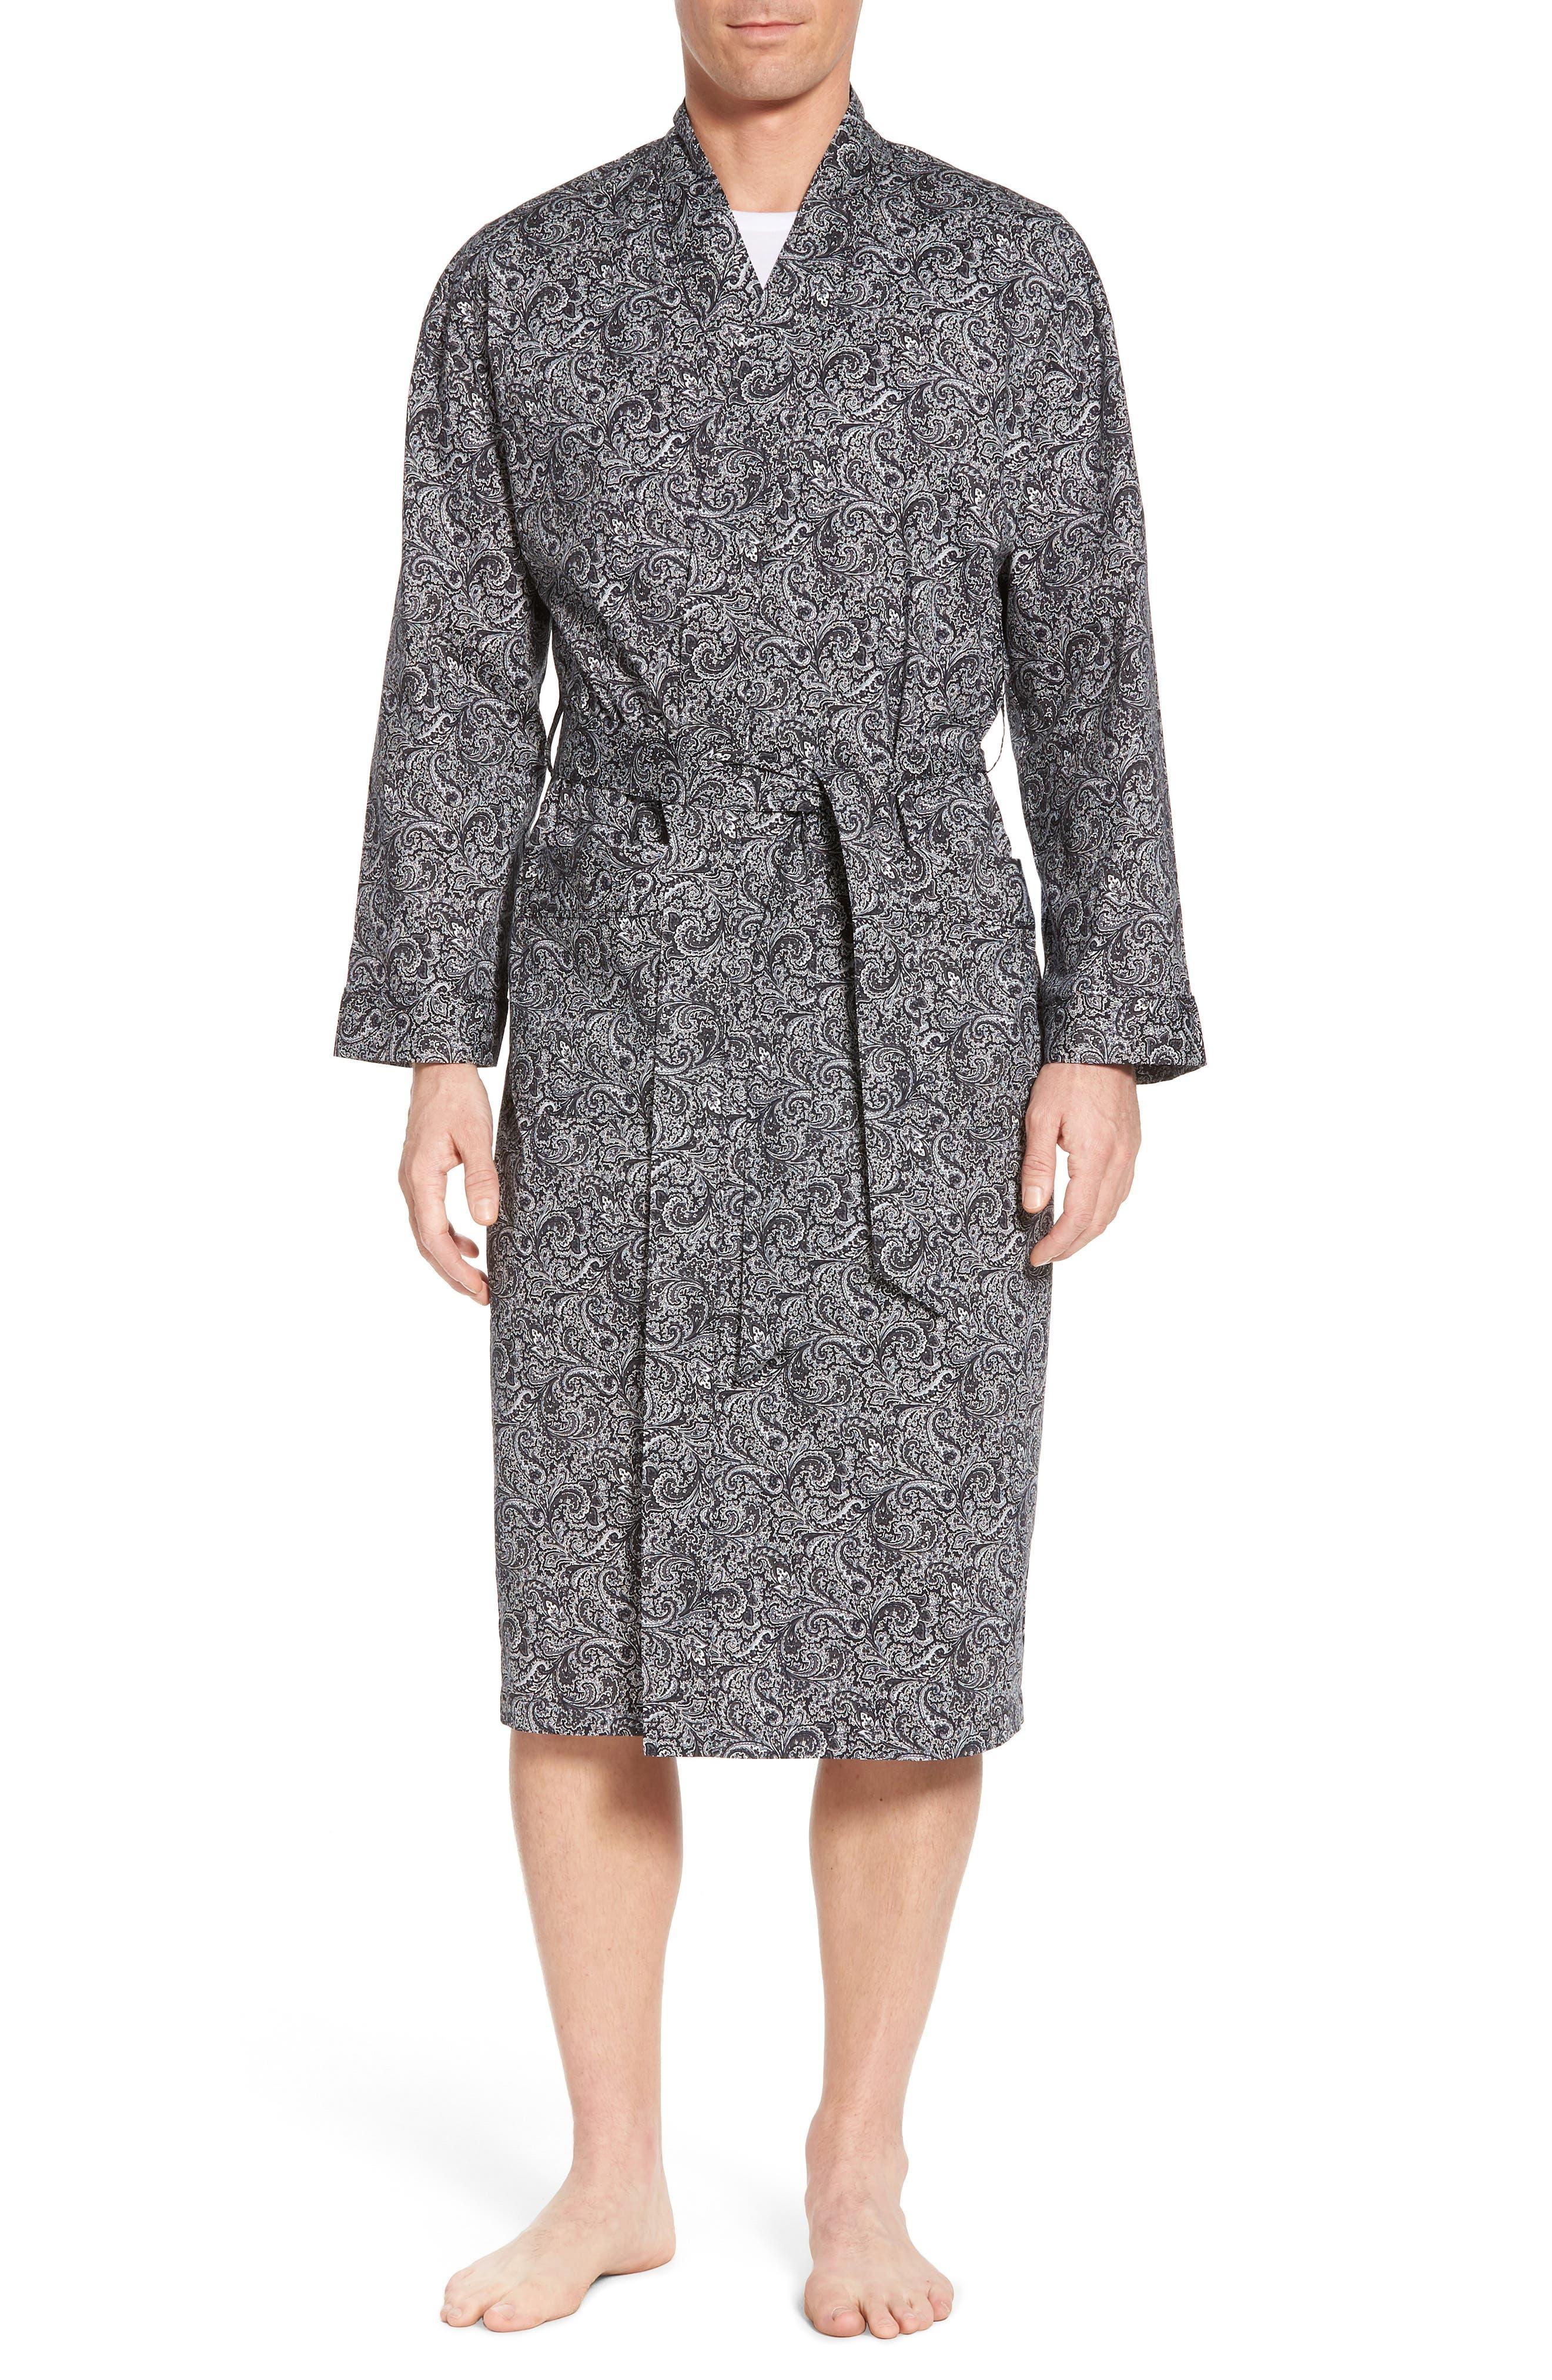 MAJESTIC INTERNATIONAL Starling Robe, Main, color, 002